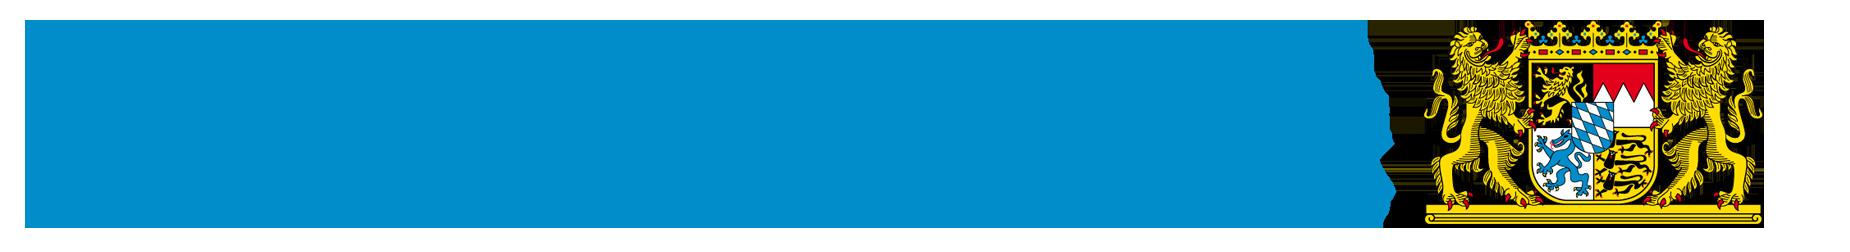 Staatsministerium Innovationspreis 2020